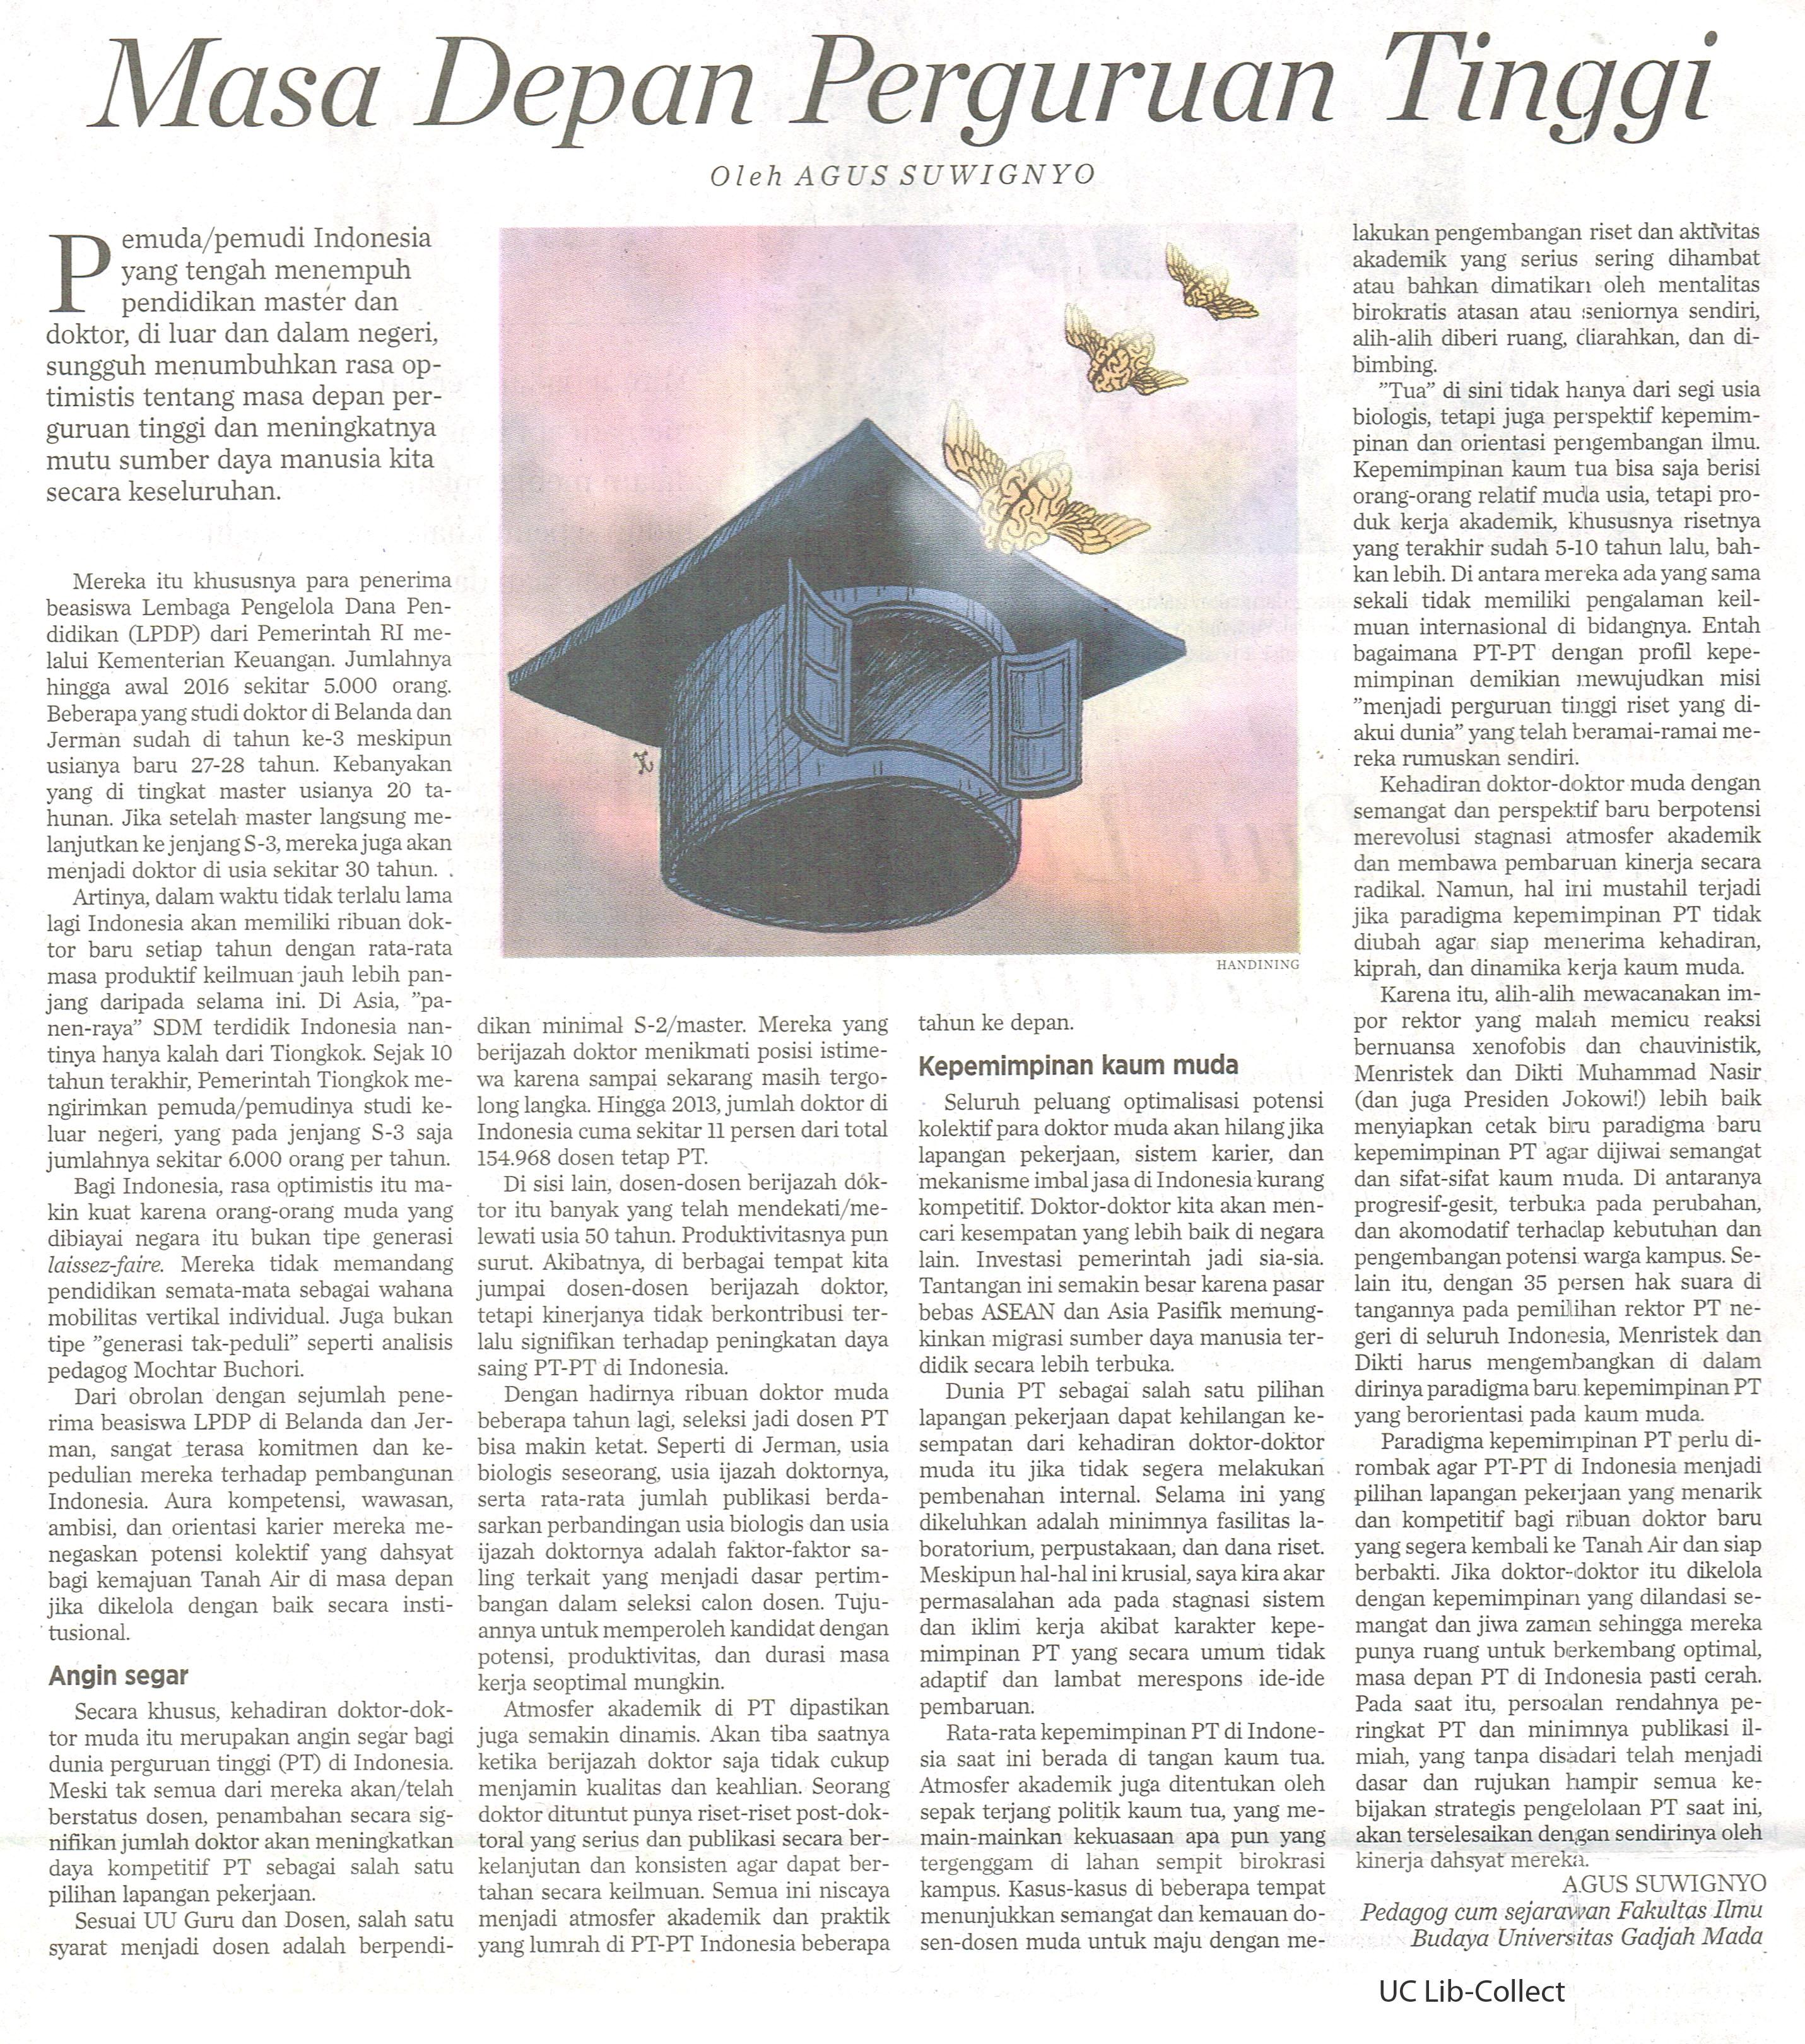 Masa Depan Perguruan Tinggi. Kompas.21 Juni 2016.Hal.6